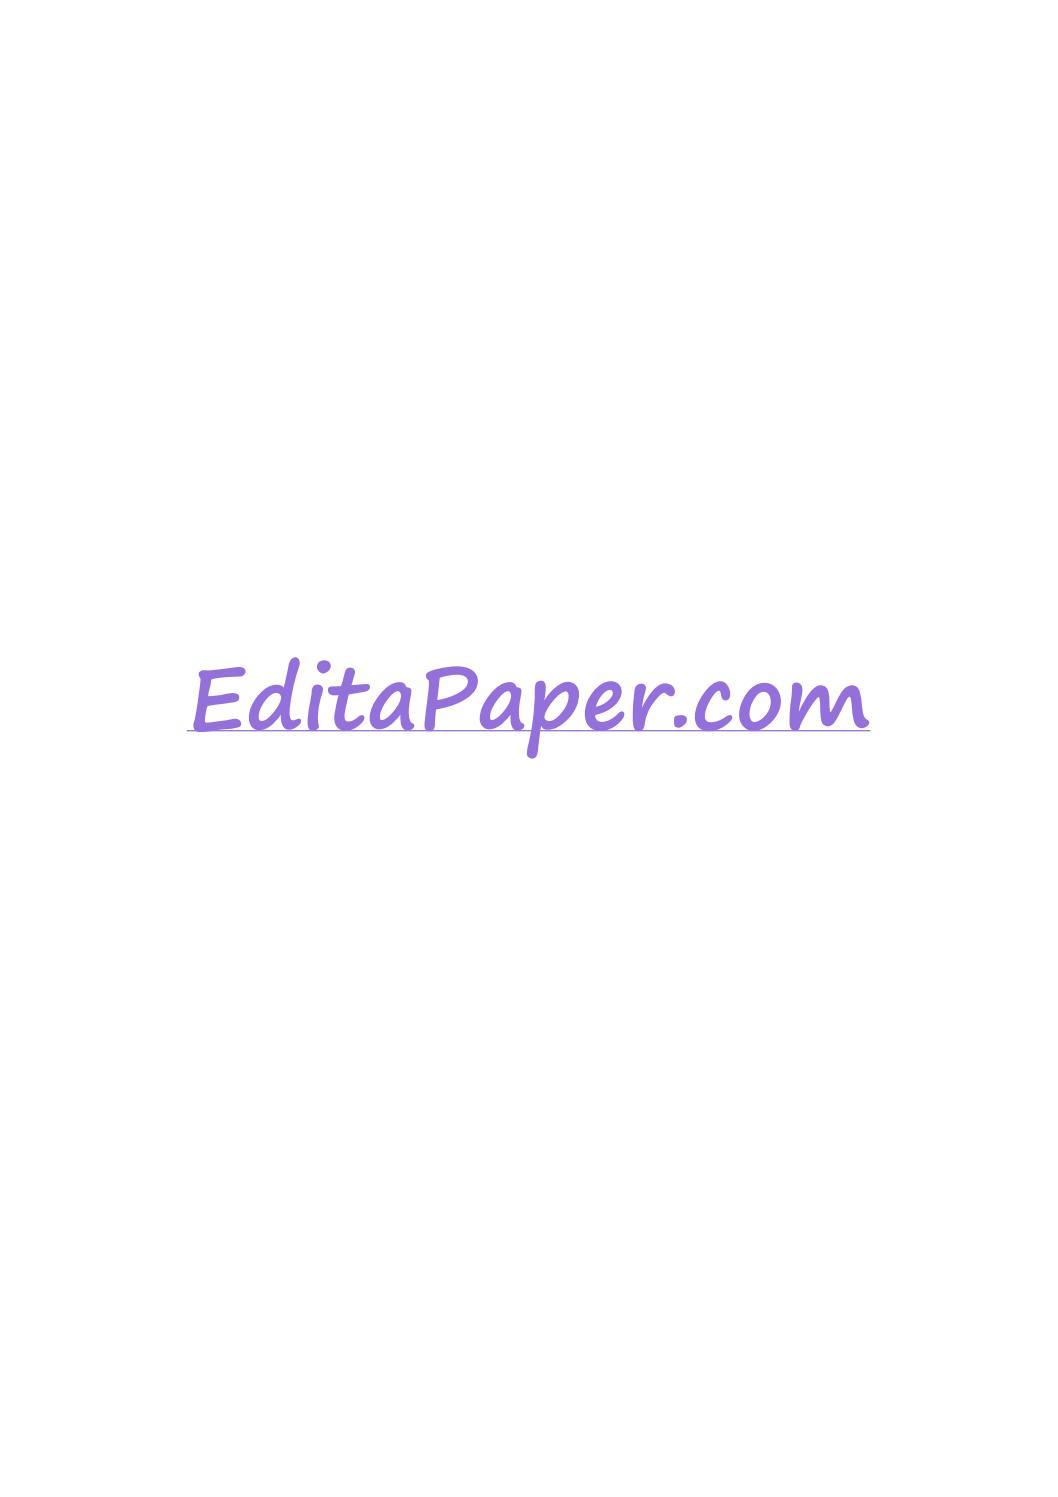 Dissertation help scam site business card